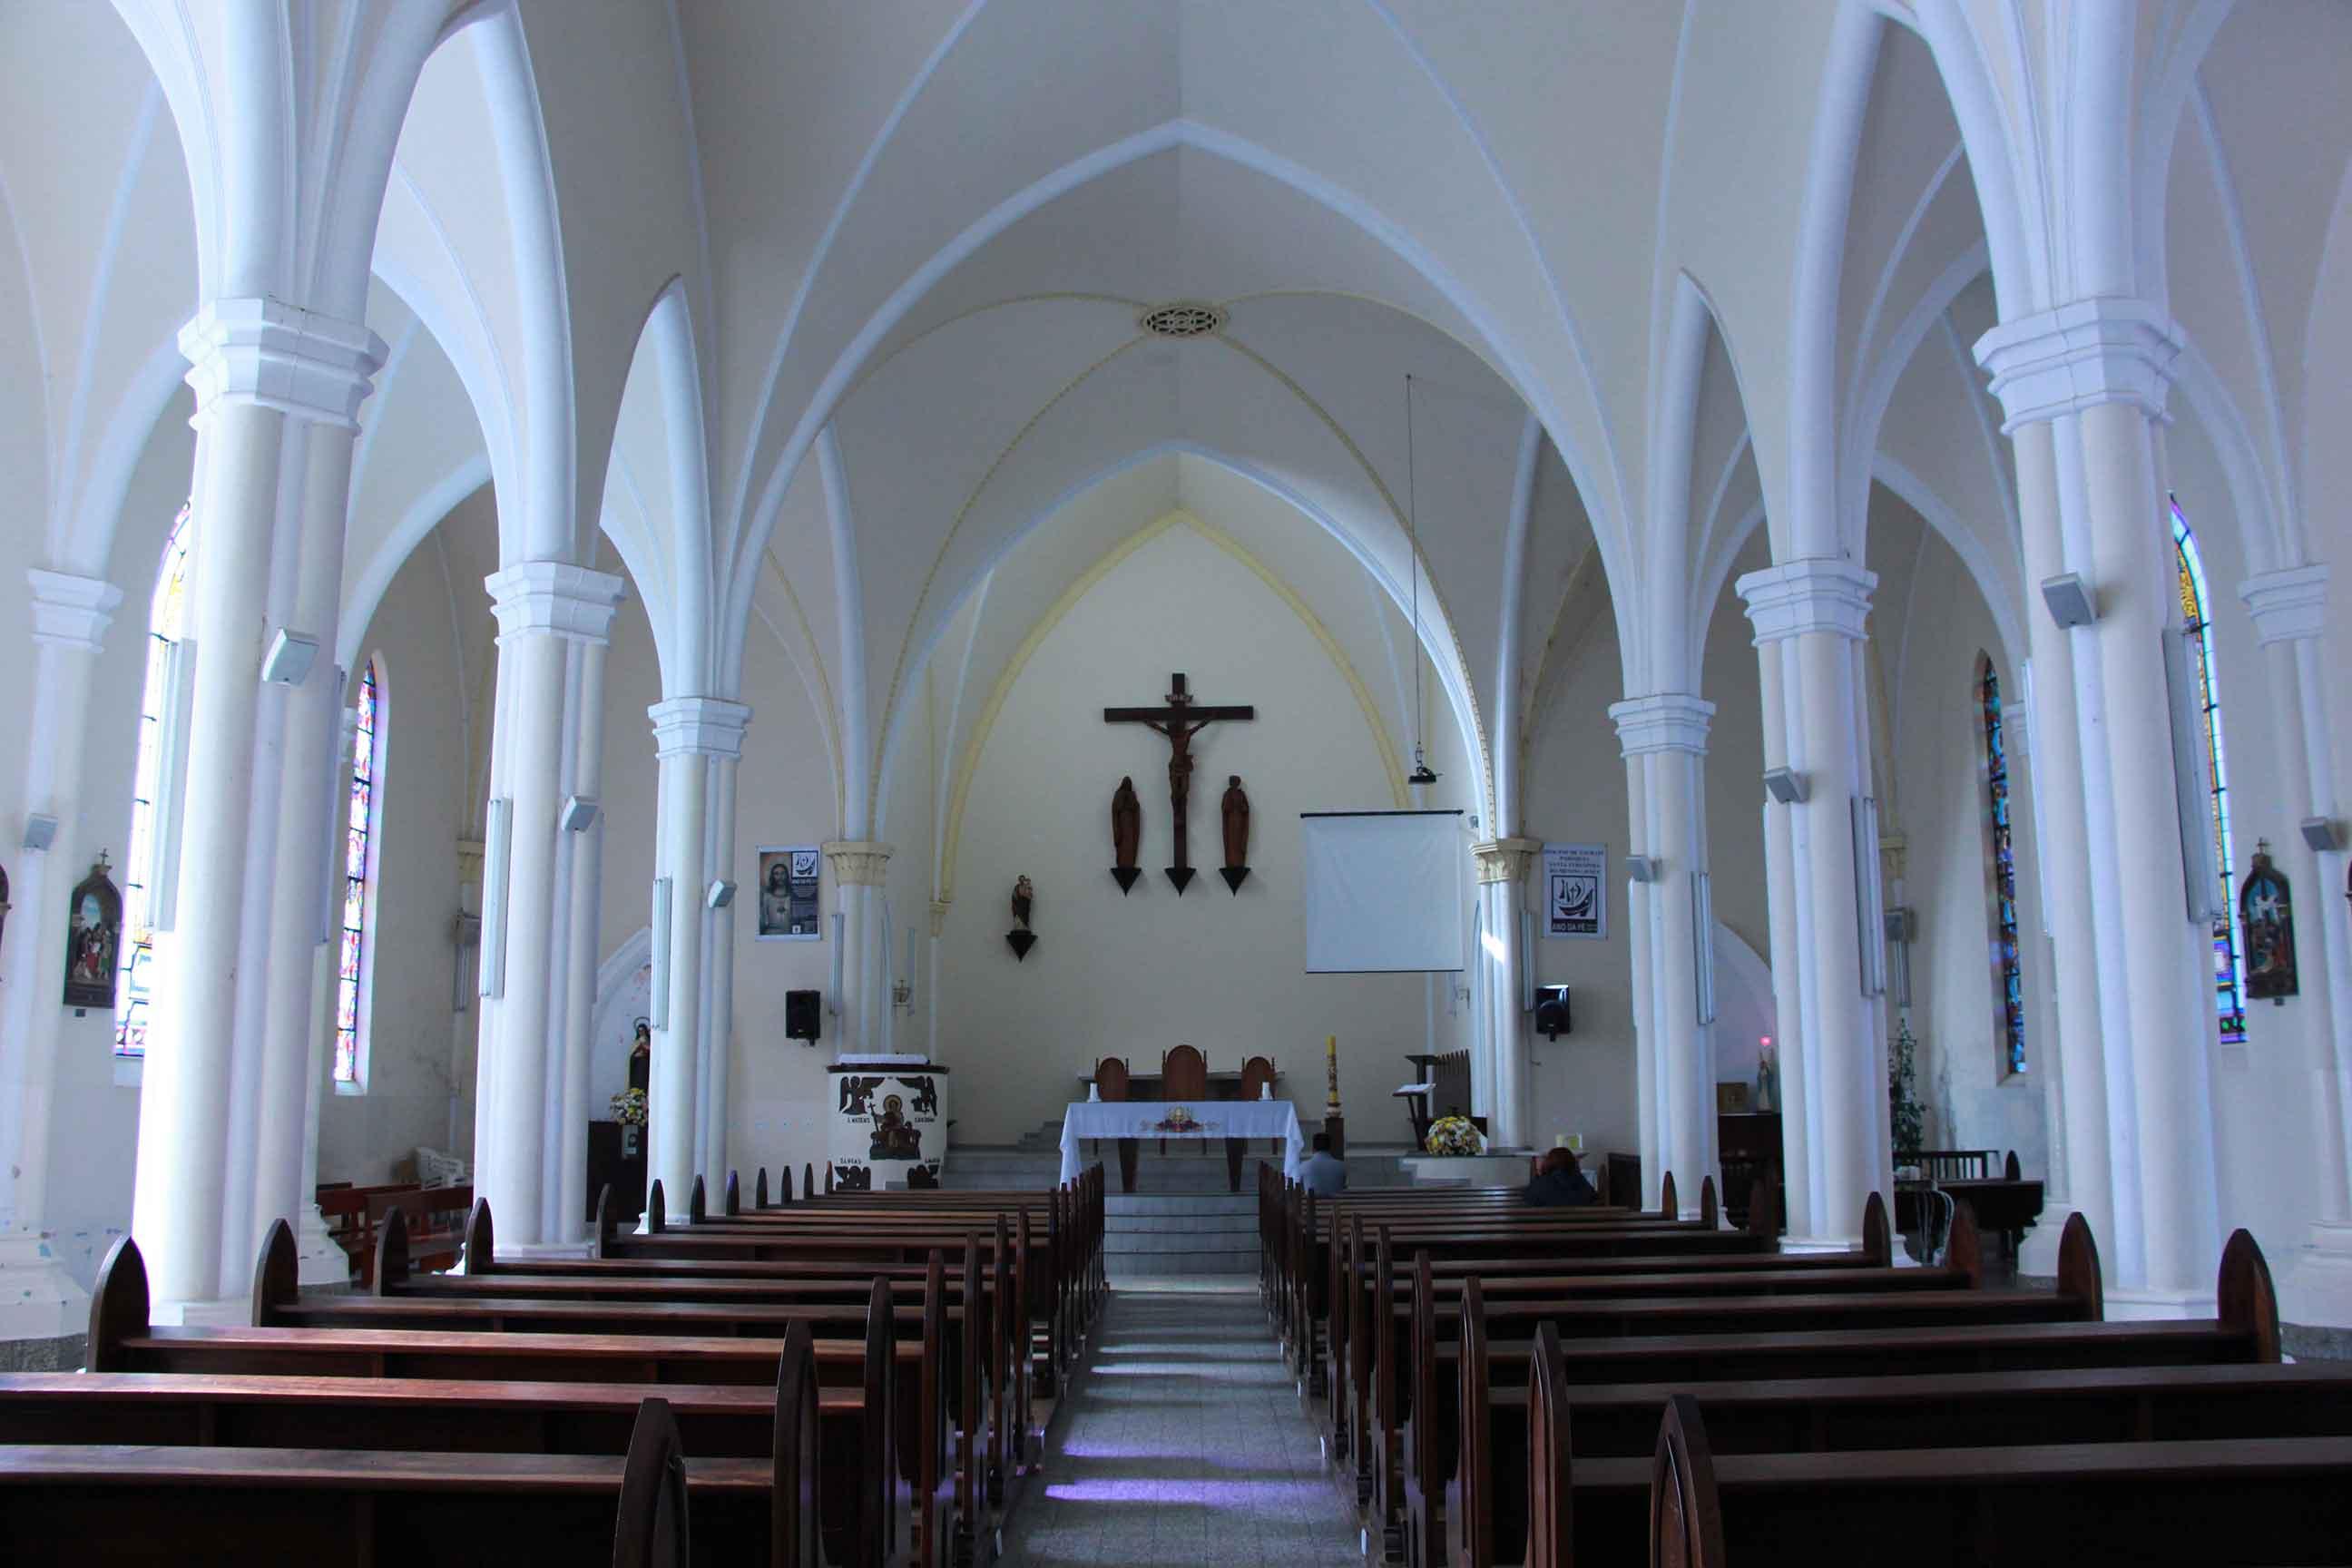 Igreja Matriz Santa Teresinha-Campos-do-Jordao-Turismo-Religioso-Igreja-Santa-Terezinha-Matriz-IMG_0439-bx